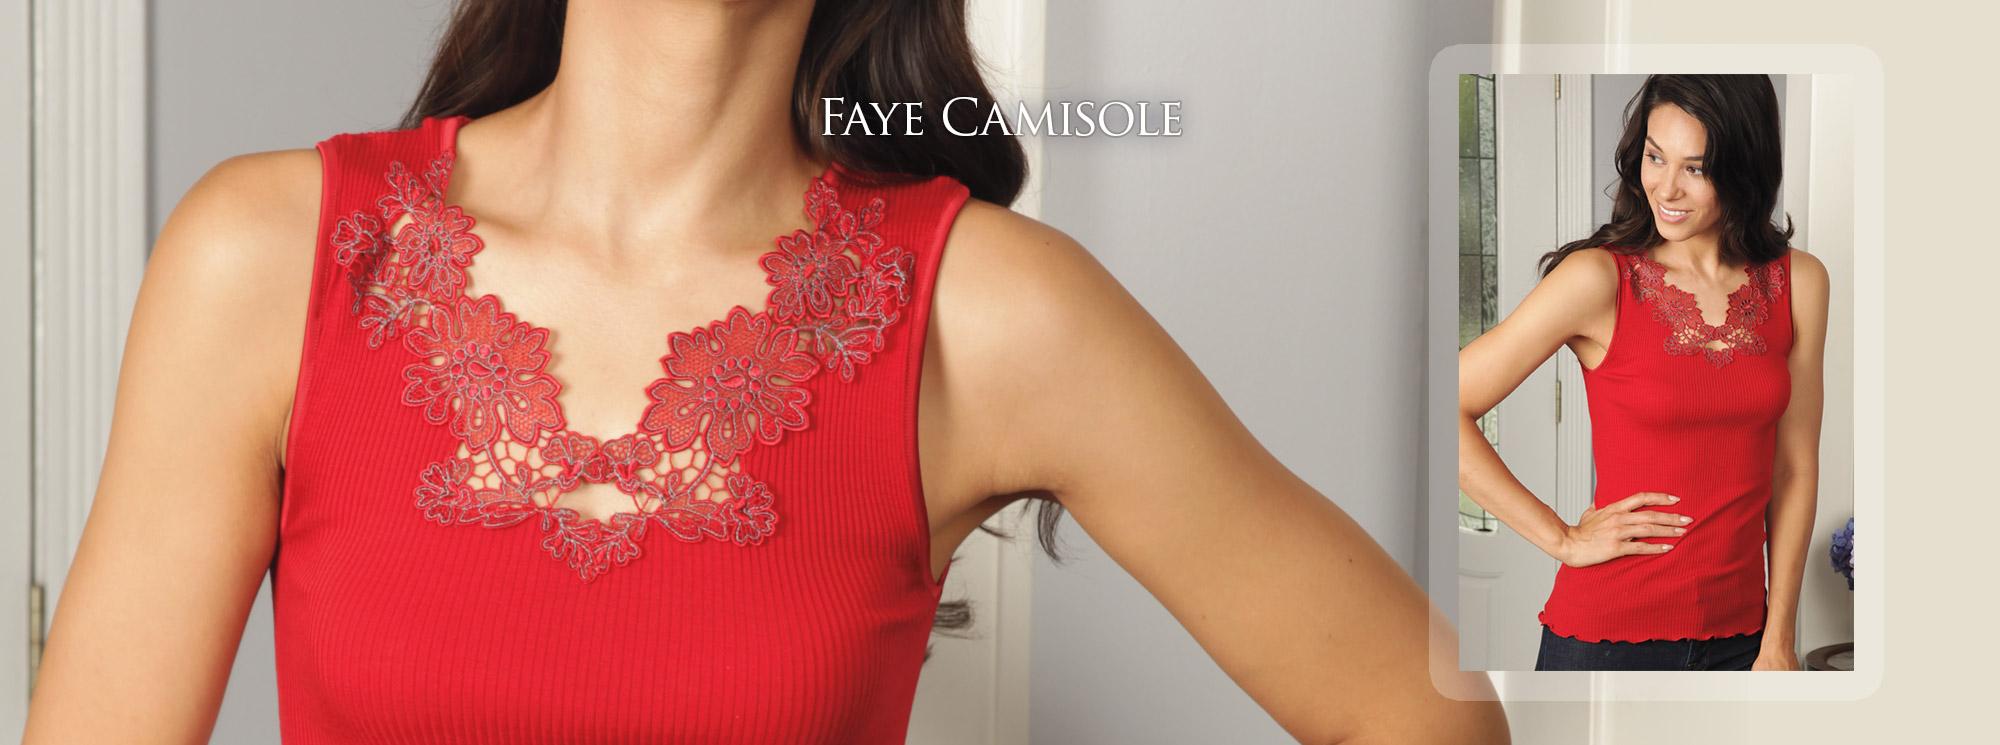 Faye Cami